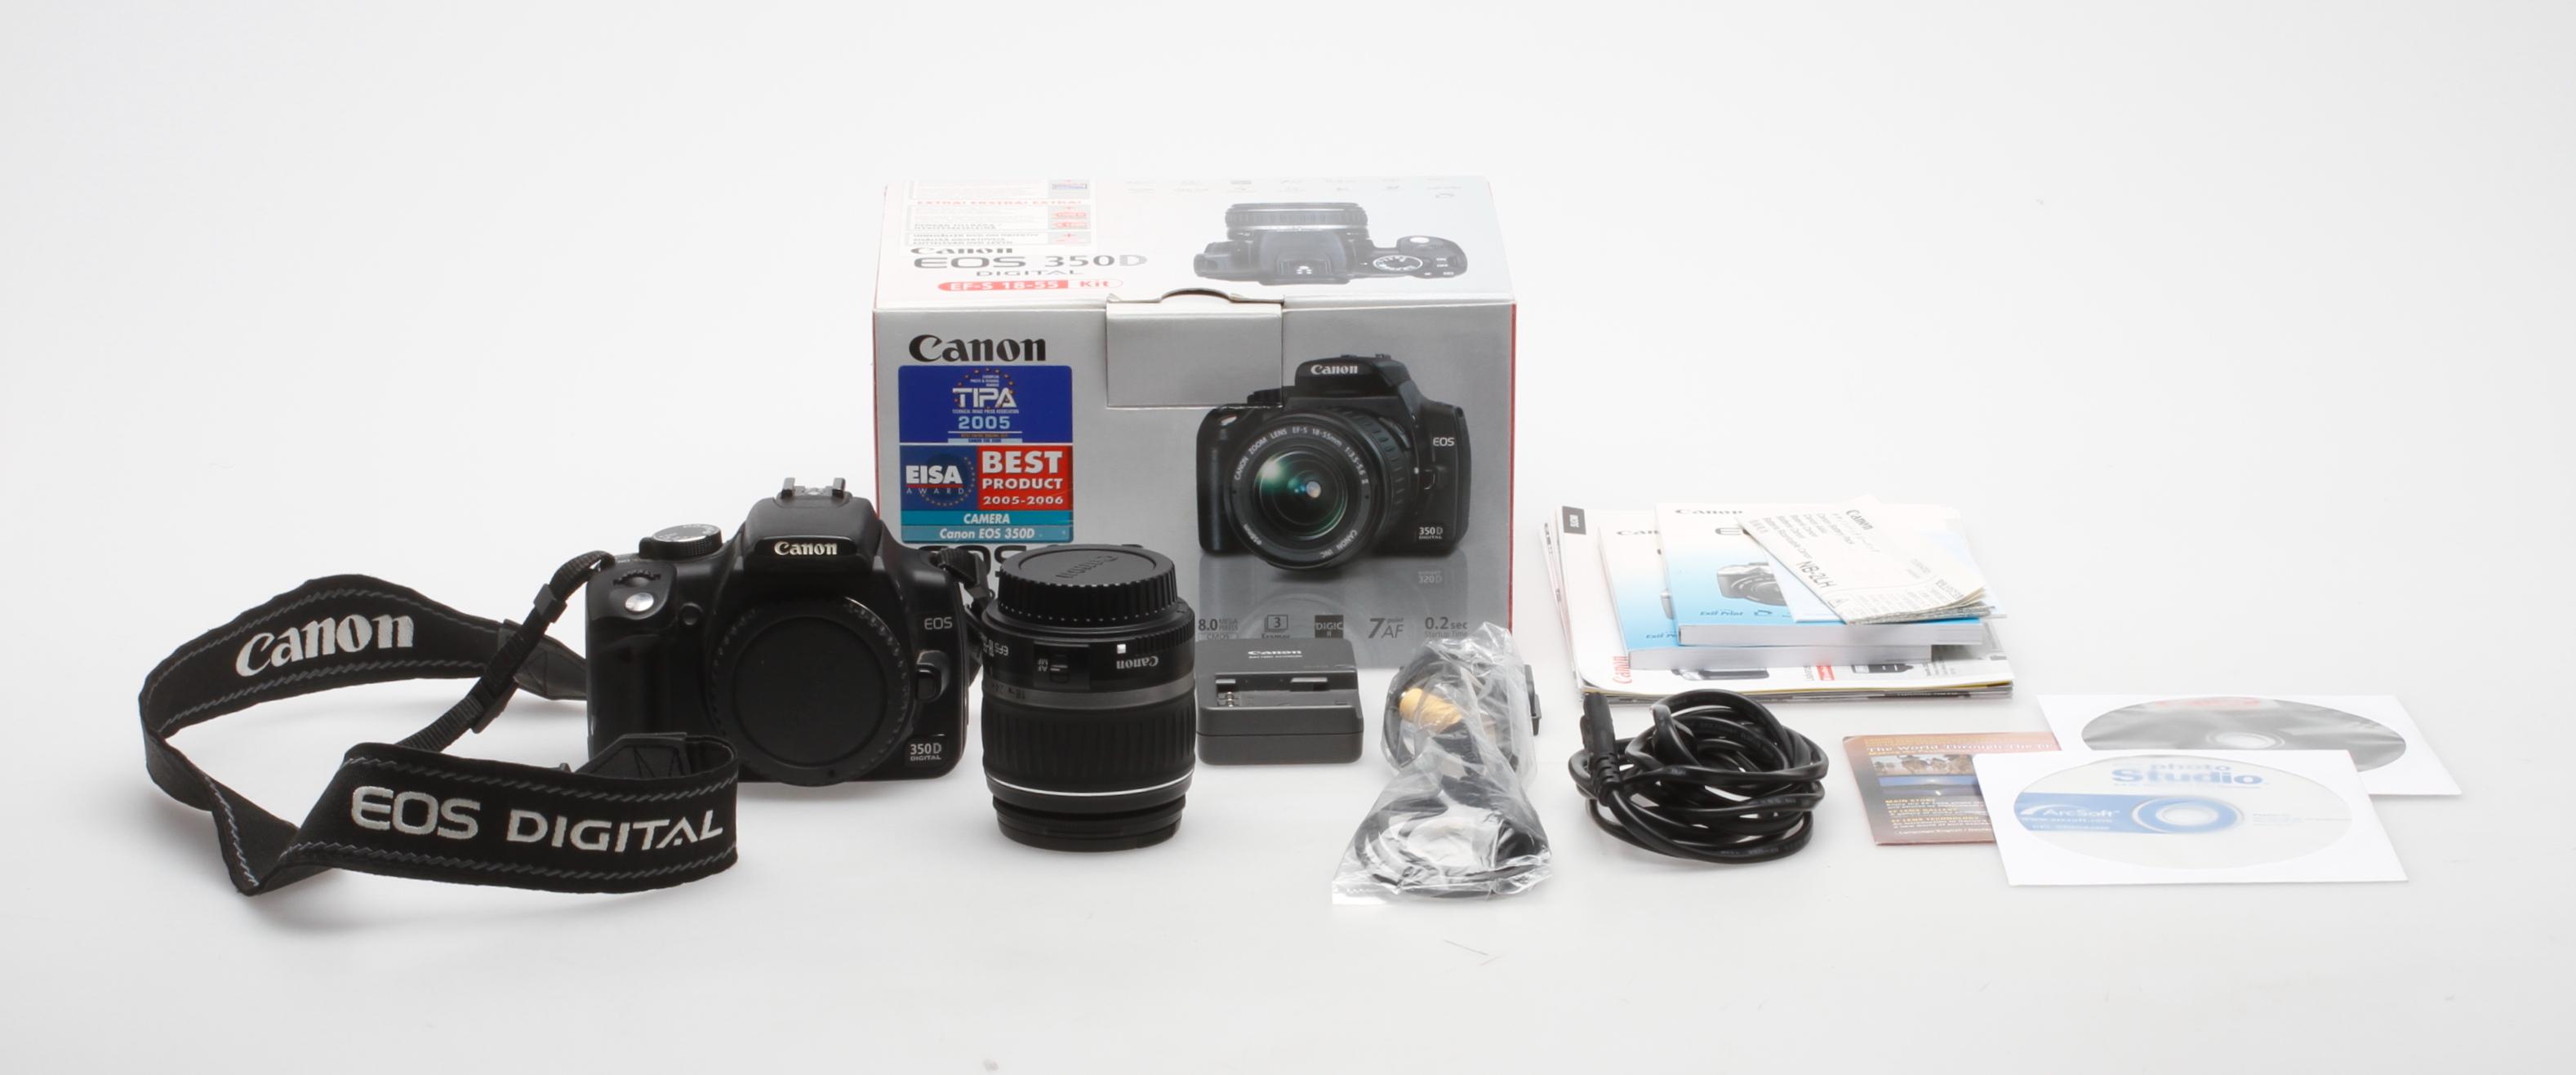 Images for 97939  DIGITAL SYSTEMKAMERA, EOS 350D, 18-55mm